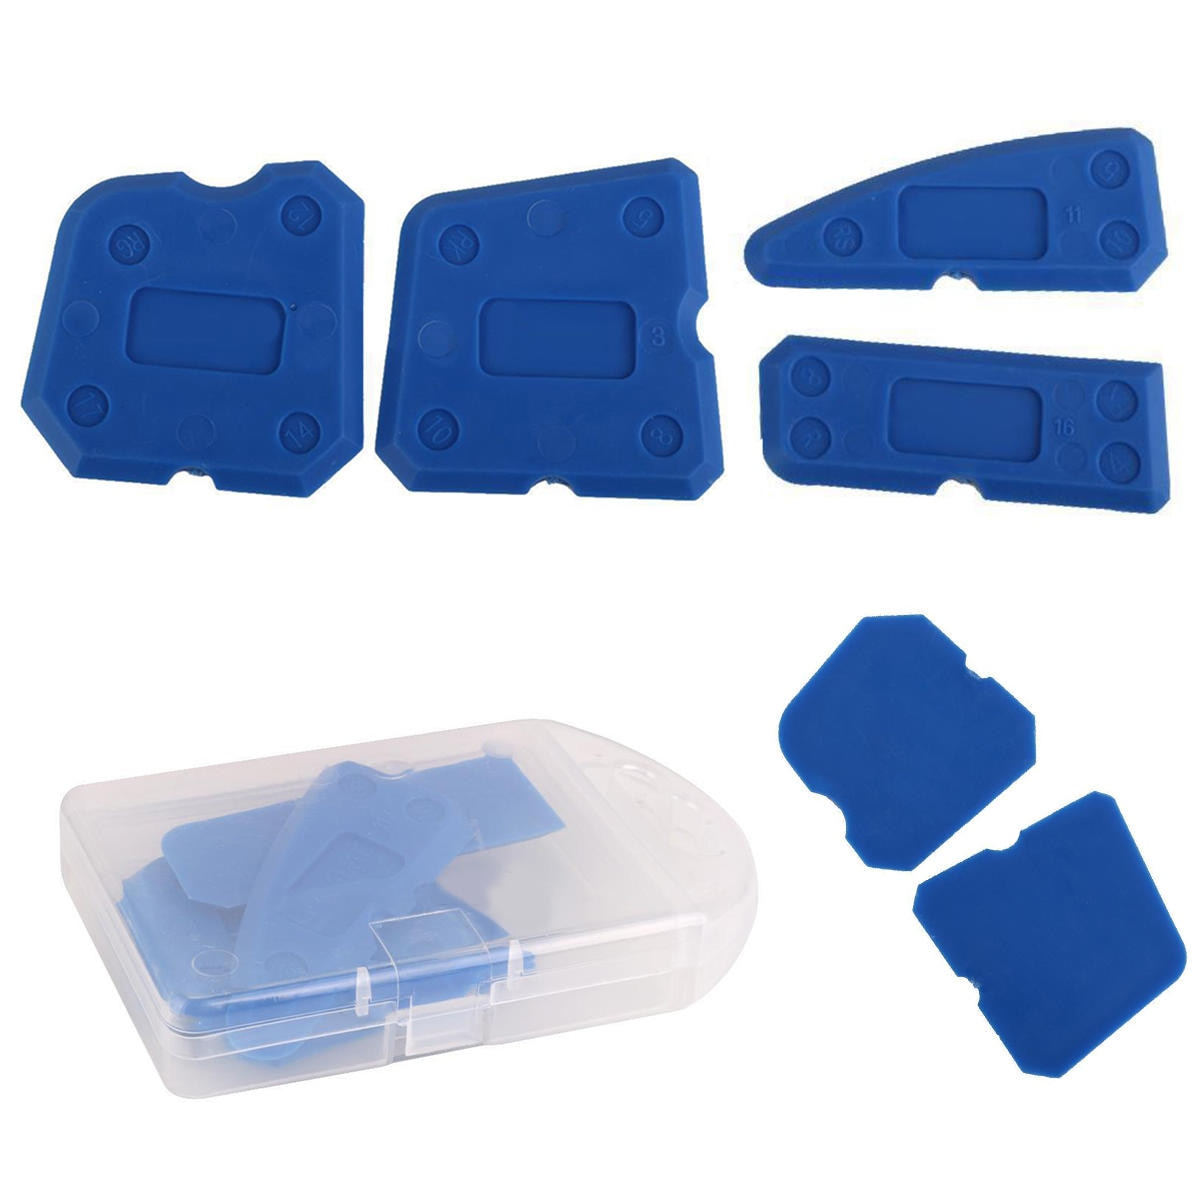 4 Uds sellador de silicona raspador espátula para ventana utensilio para quitar masilla o cemento Kit de herramientas calafateo removedor de acabado